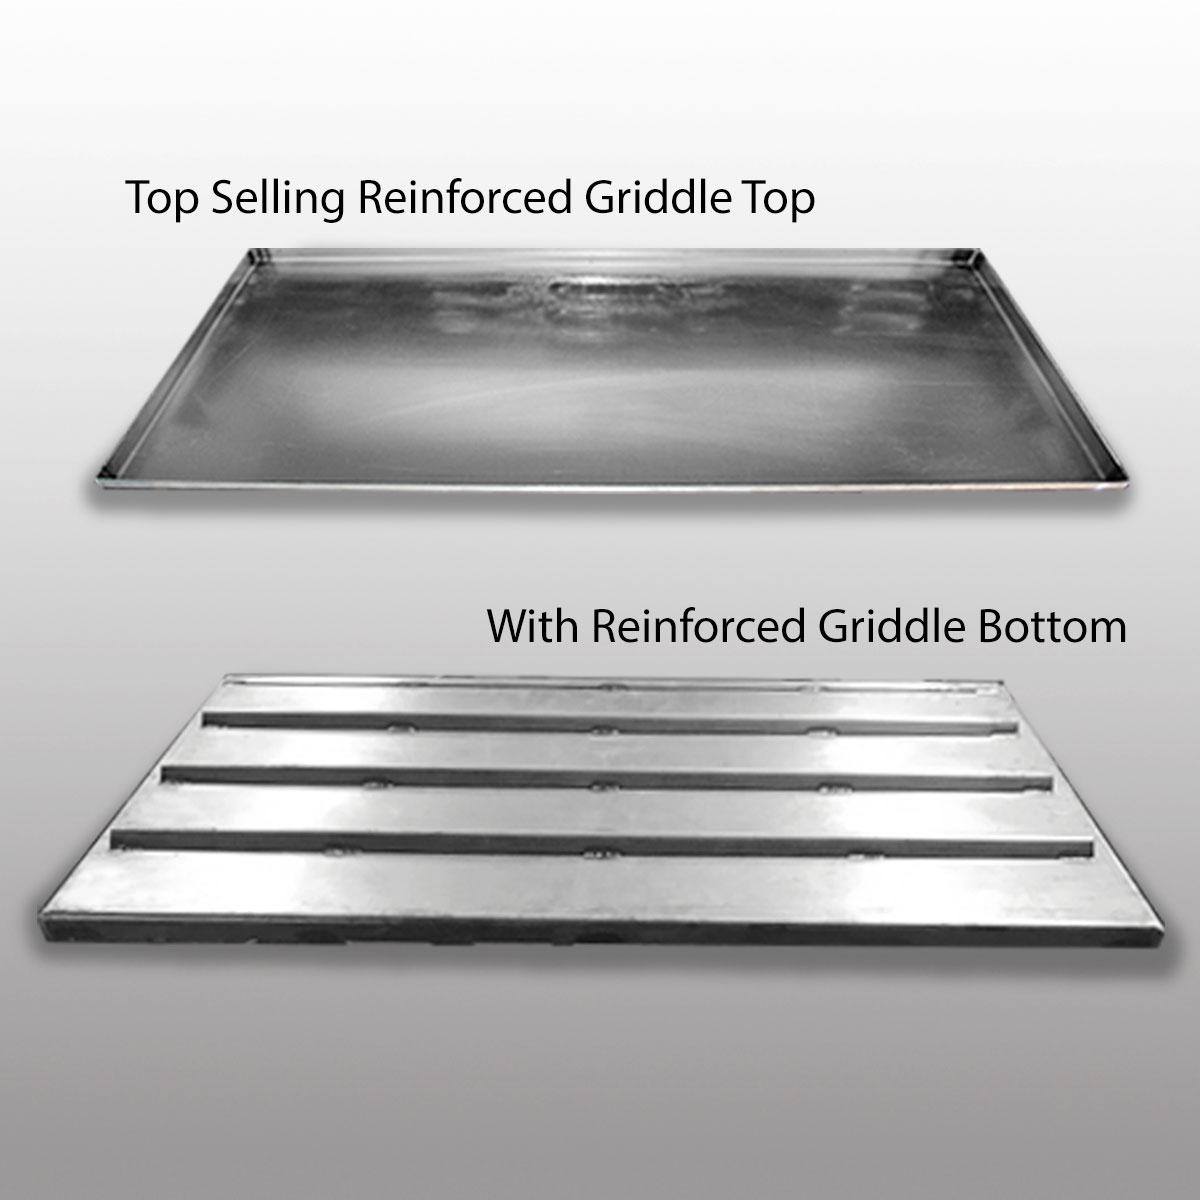 Top Selling Reinforced Griddle Master Griddle Top For All Grills | Teppanyaki  Grill Top | Griddle Top Plate | Custom BBQ Griddle Top | Outdoor Griddle ...